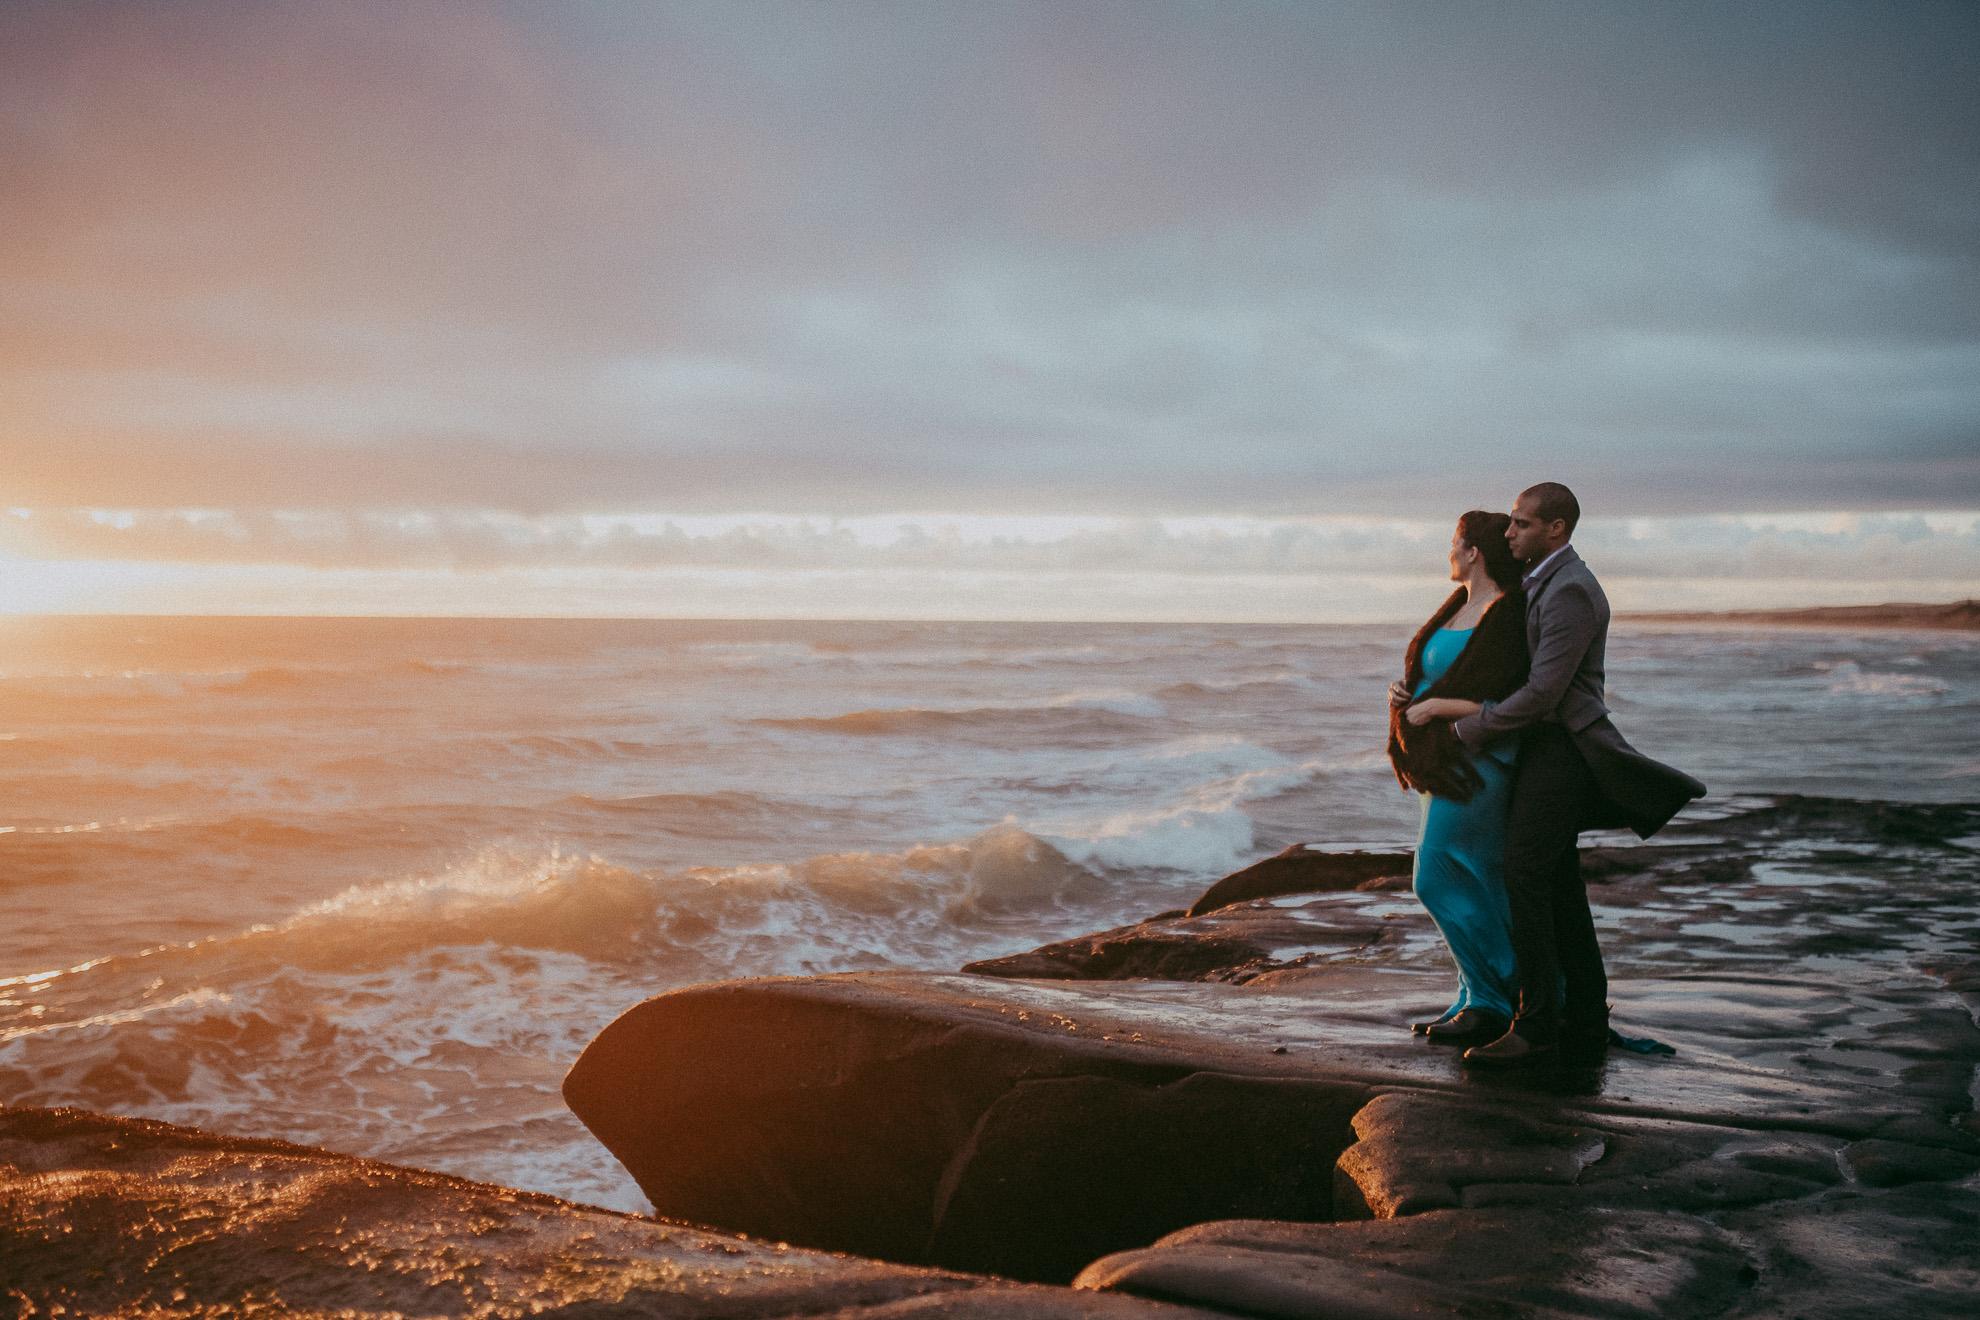 Auckland maternity photo shoot {pregnancy-baby-newborn photographer} forest+beach